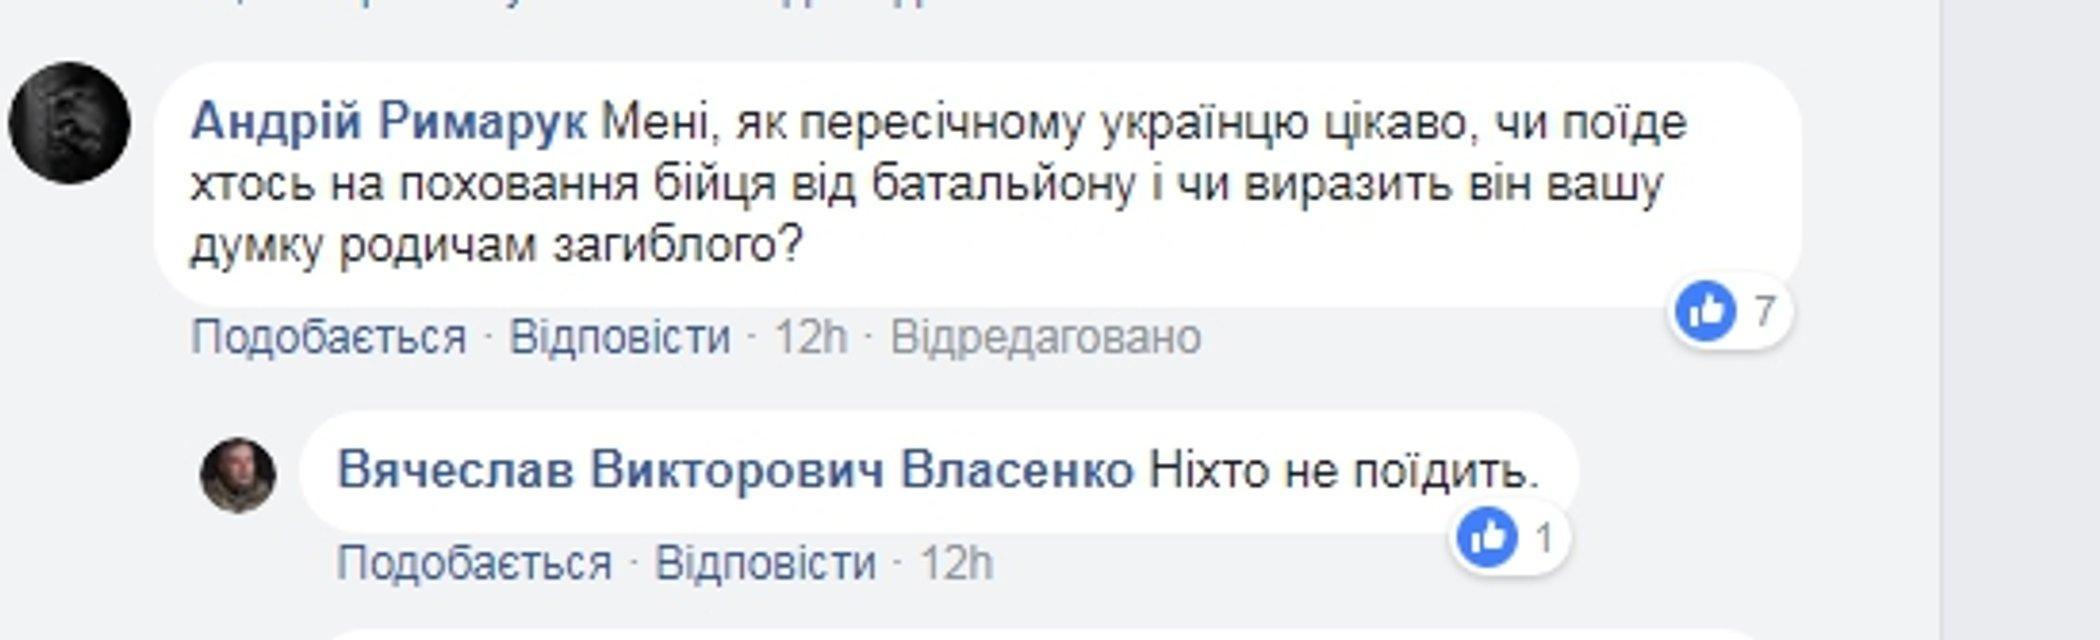 Будь мужиком: Командир цинично пошутил о самоубийстве бойца ВСУ - фото 106034